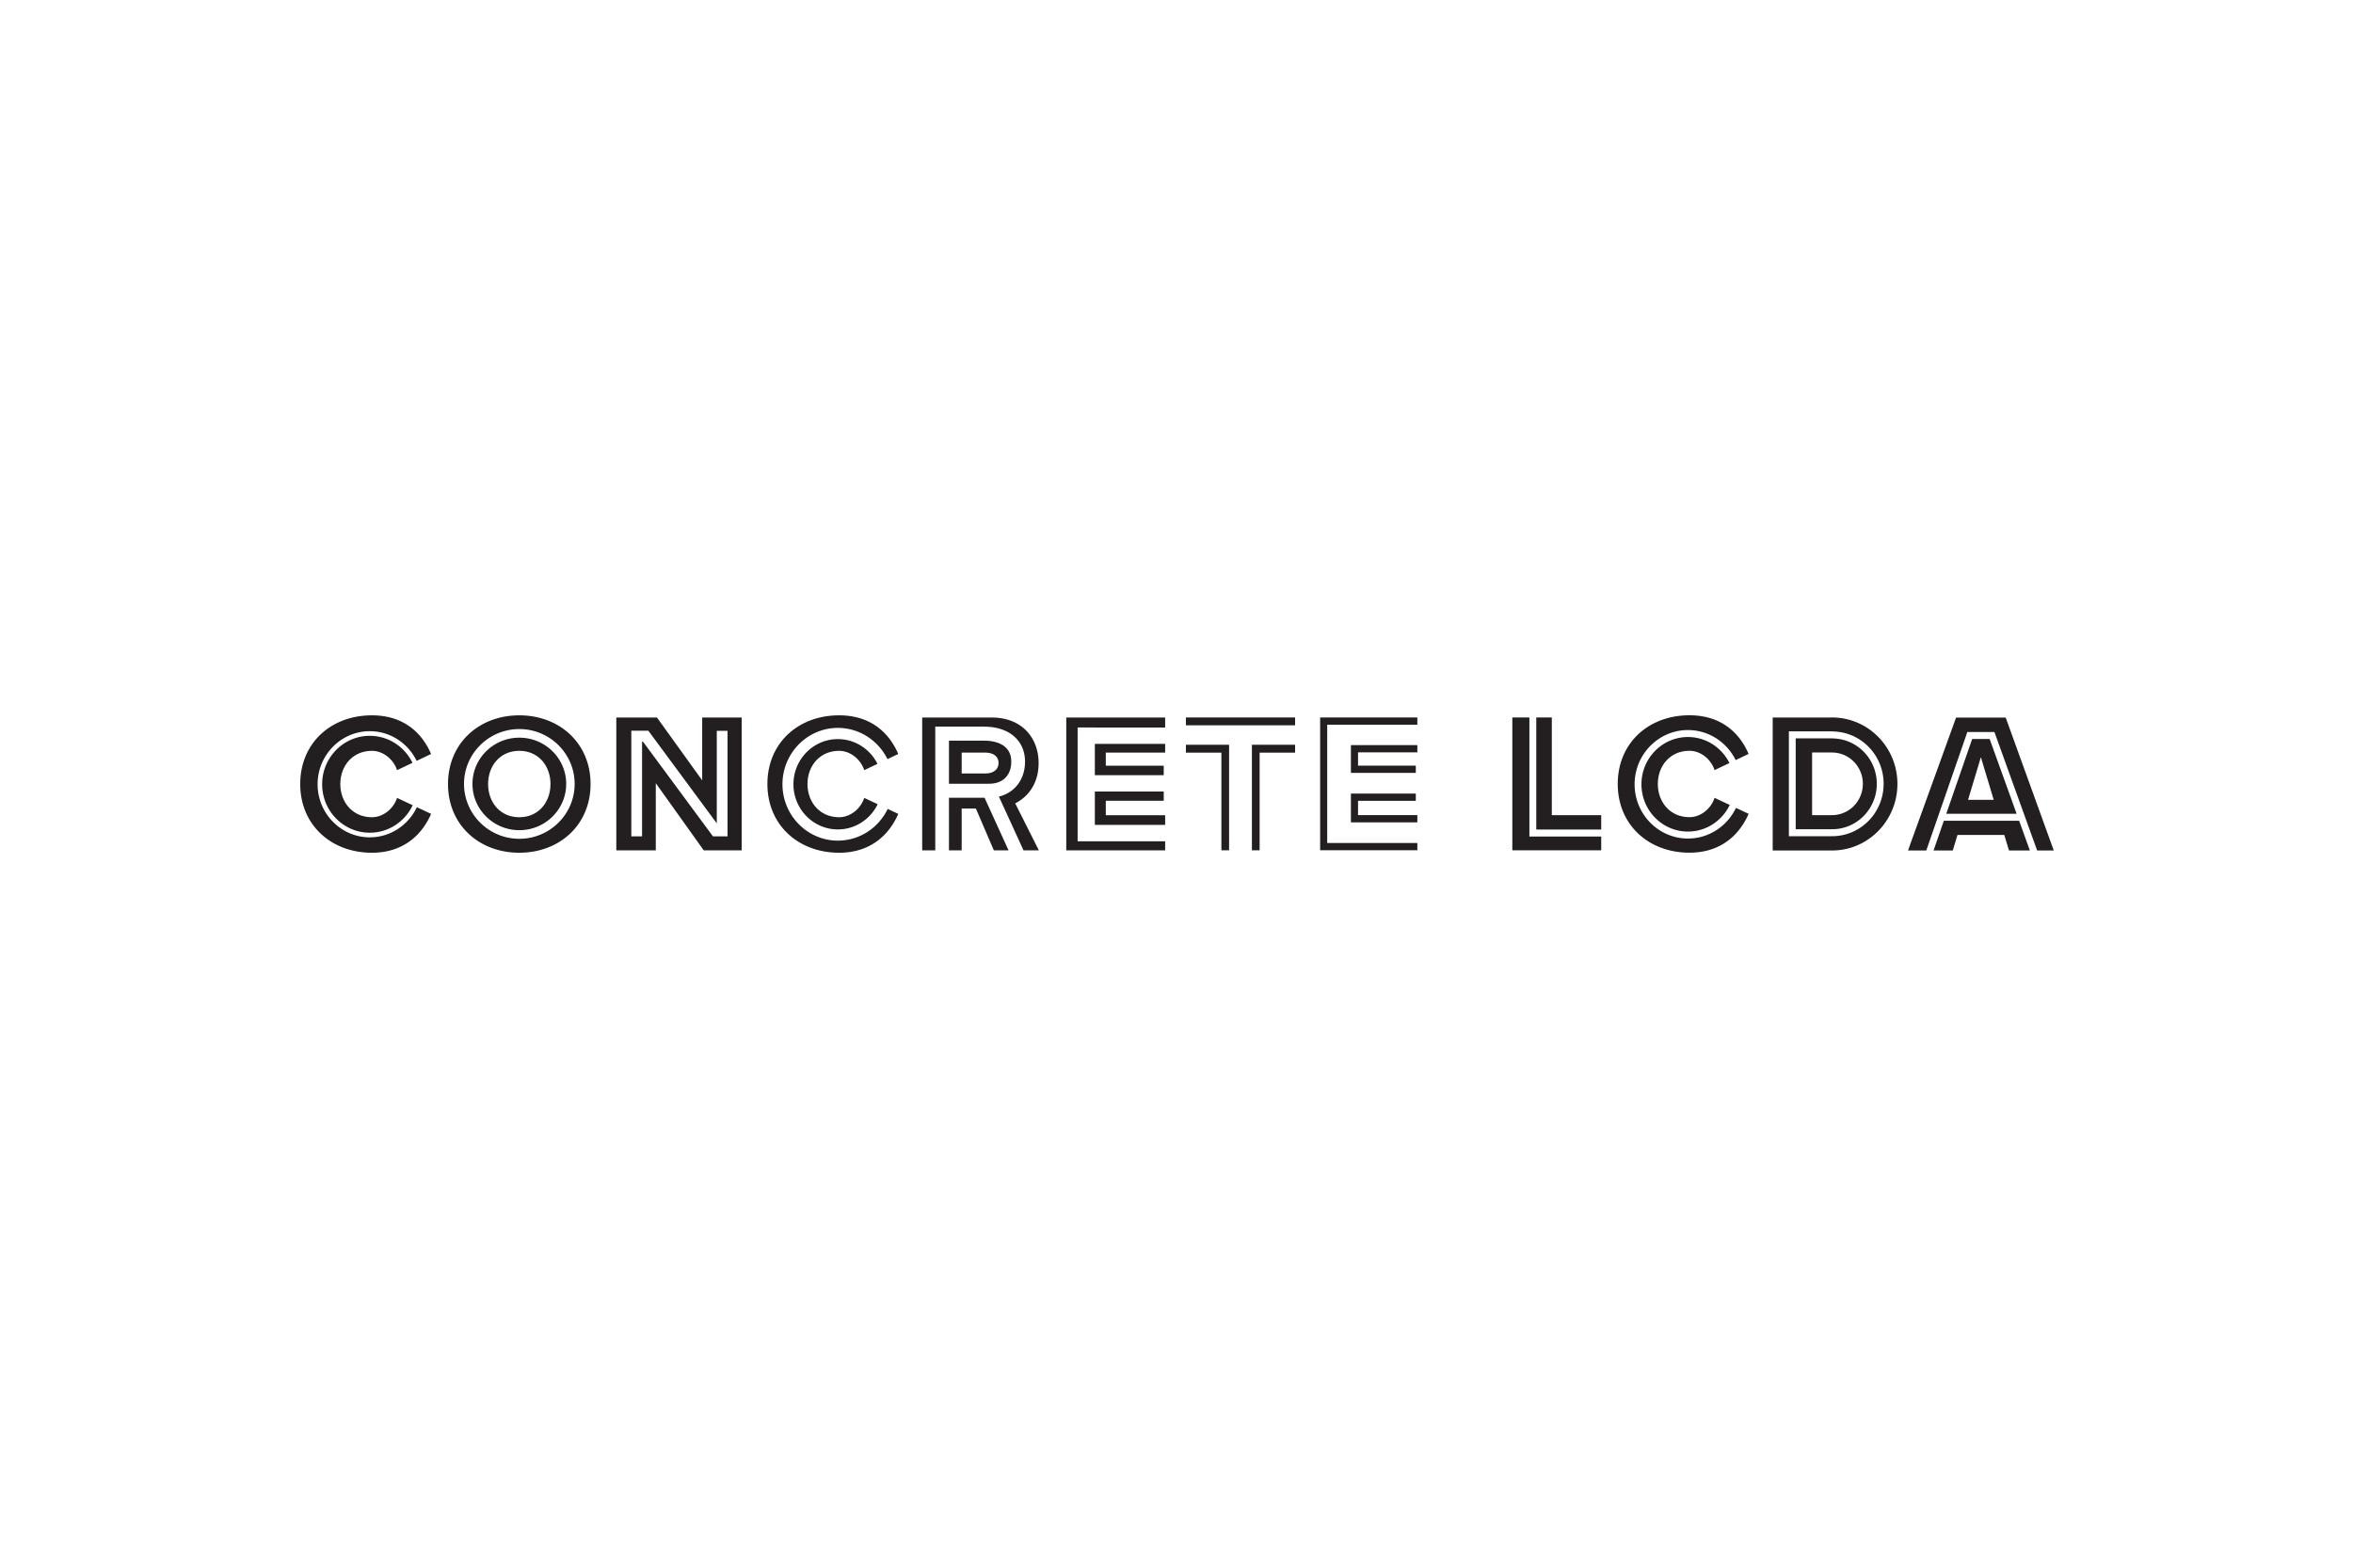 concrete_lcda_logo.jpg